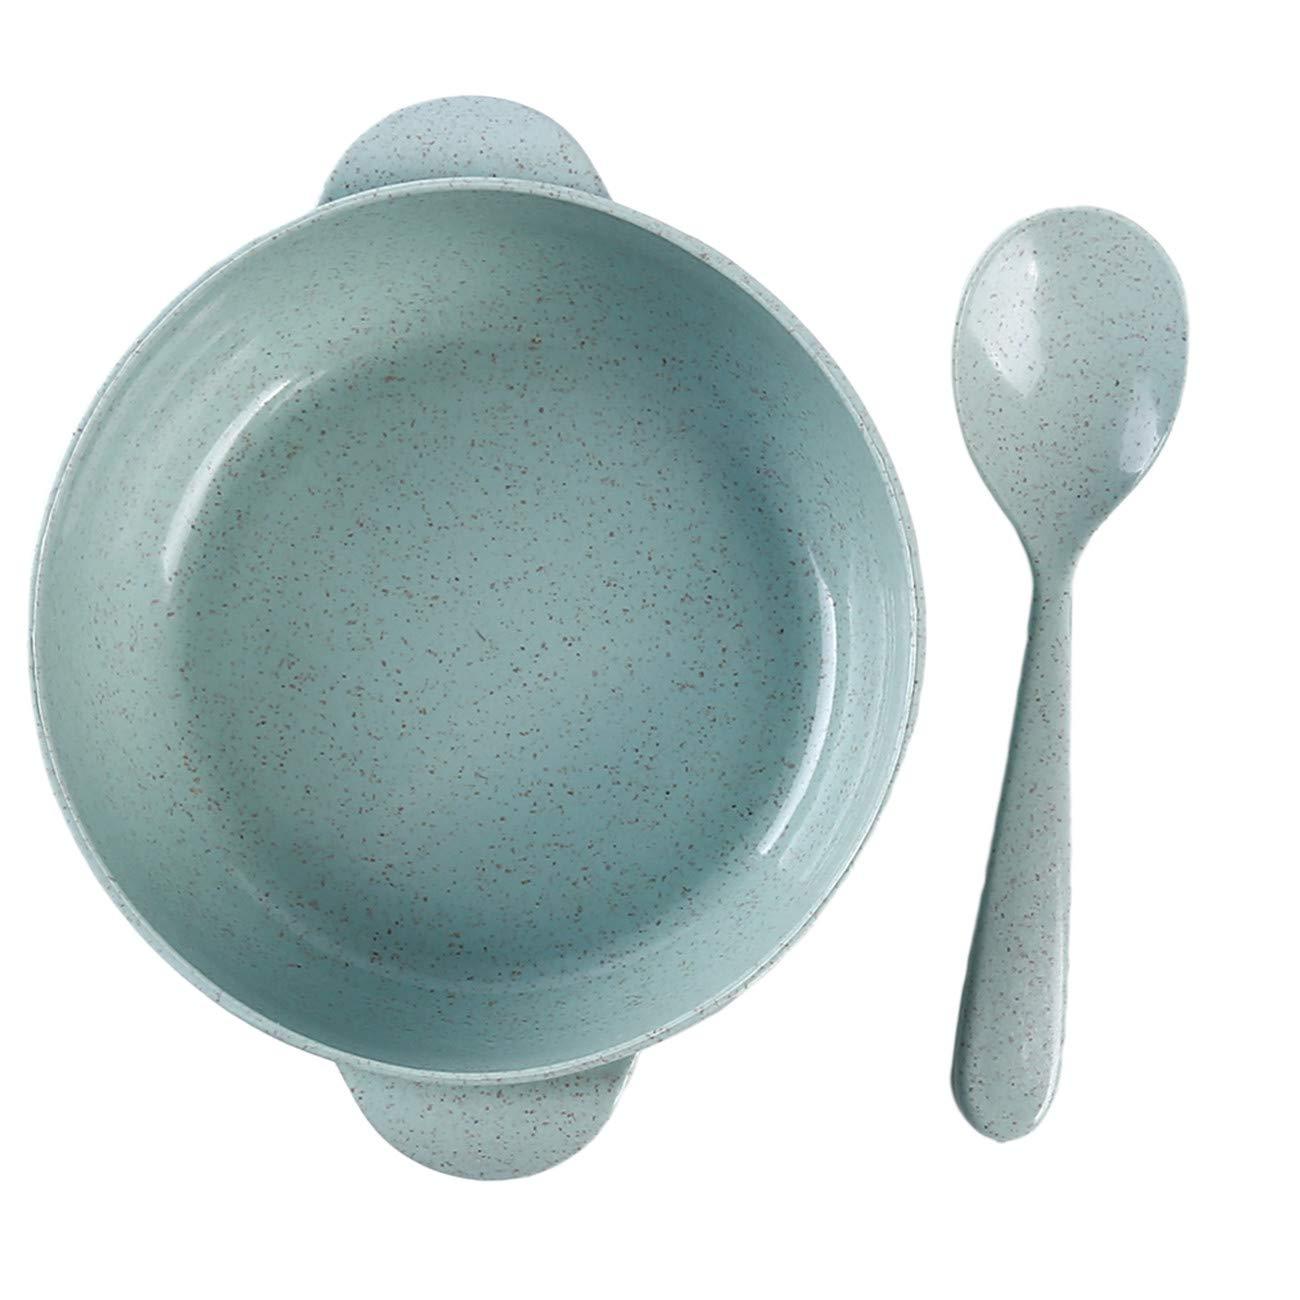 ZALING Baby Dinnerware Set Kids Training Tableware Children Solid Feeding Bowl Dishes with Spoon Pink